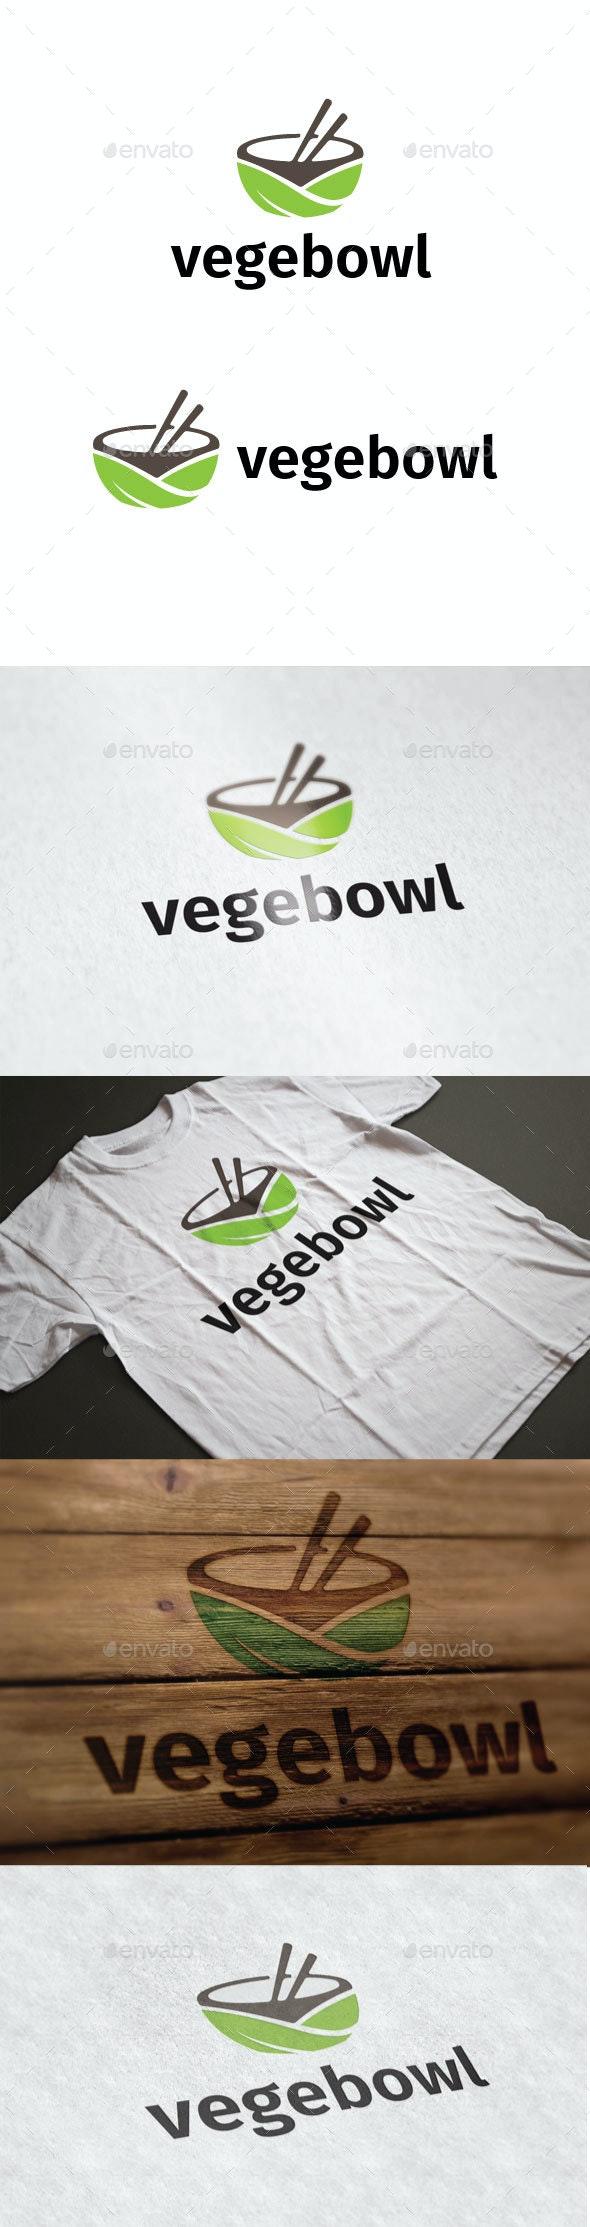 Vegebowl Logo - Nature Logo Templates